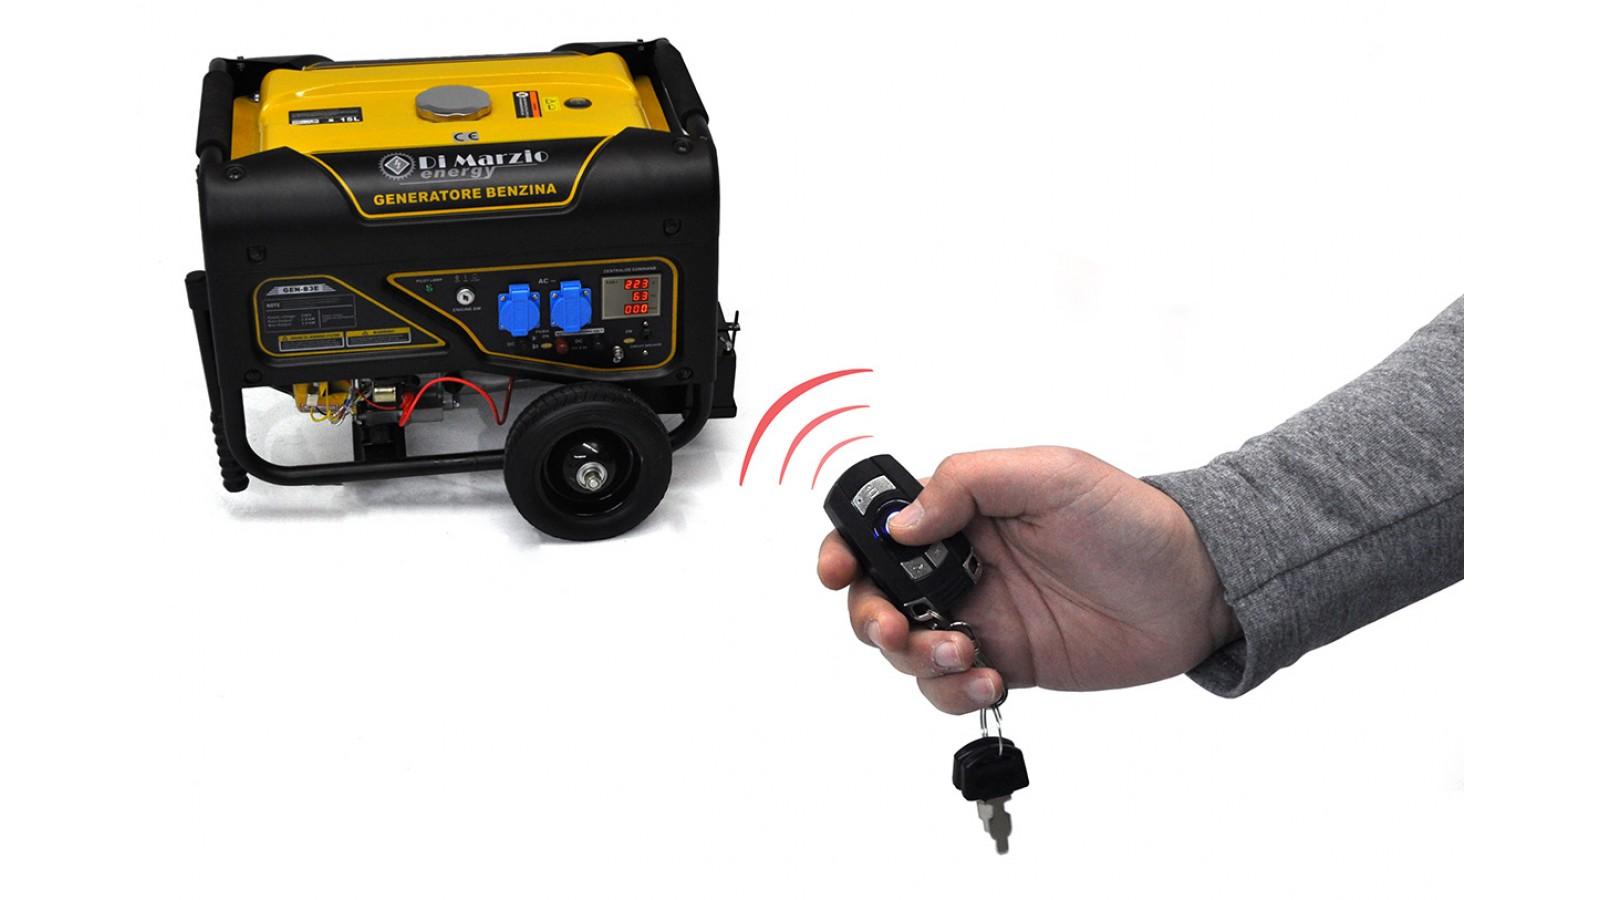 Generatore di corrente 3 kw benzina avv elettrico con for Generatore di corrente con avviamento automatico